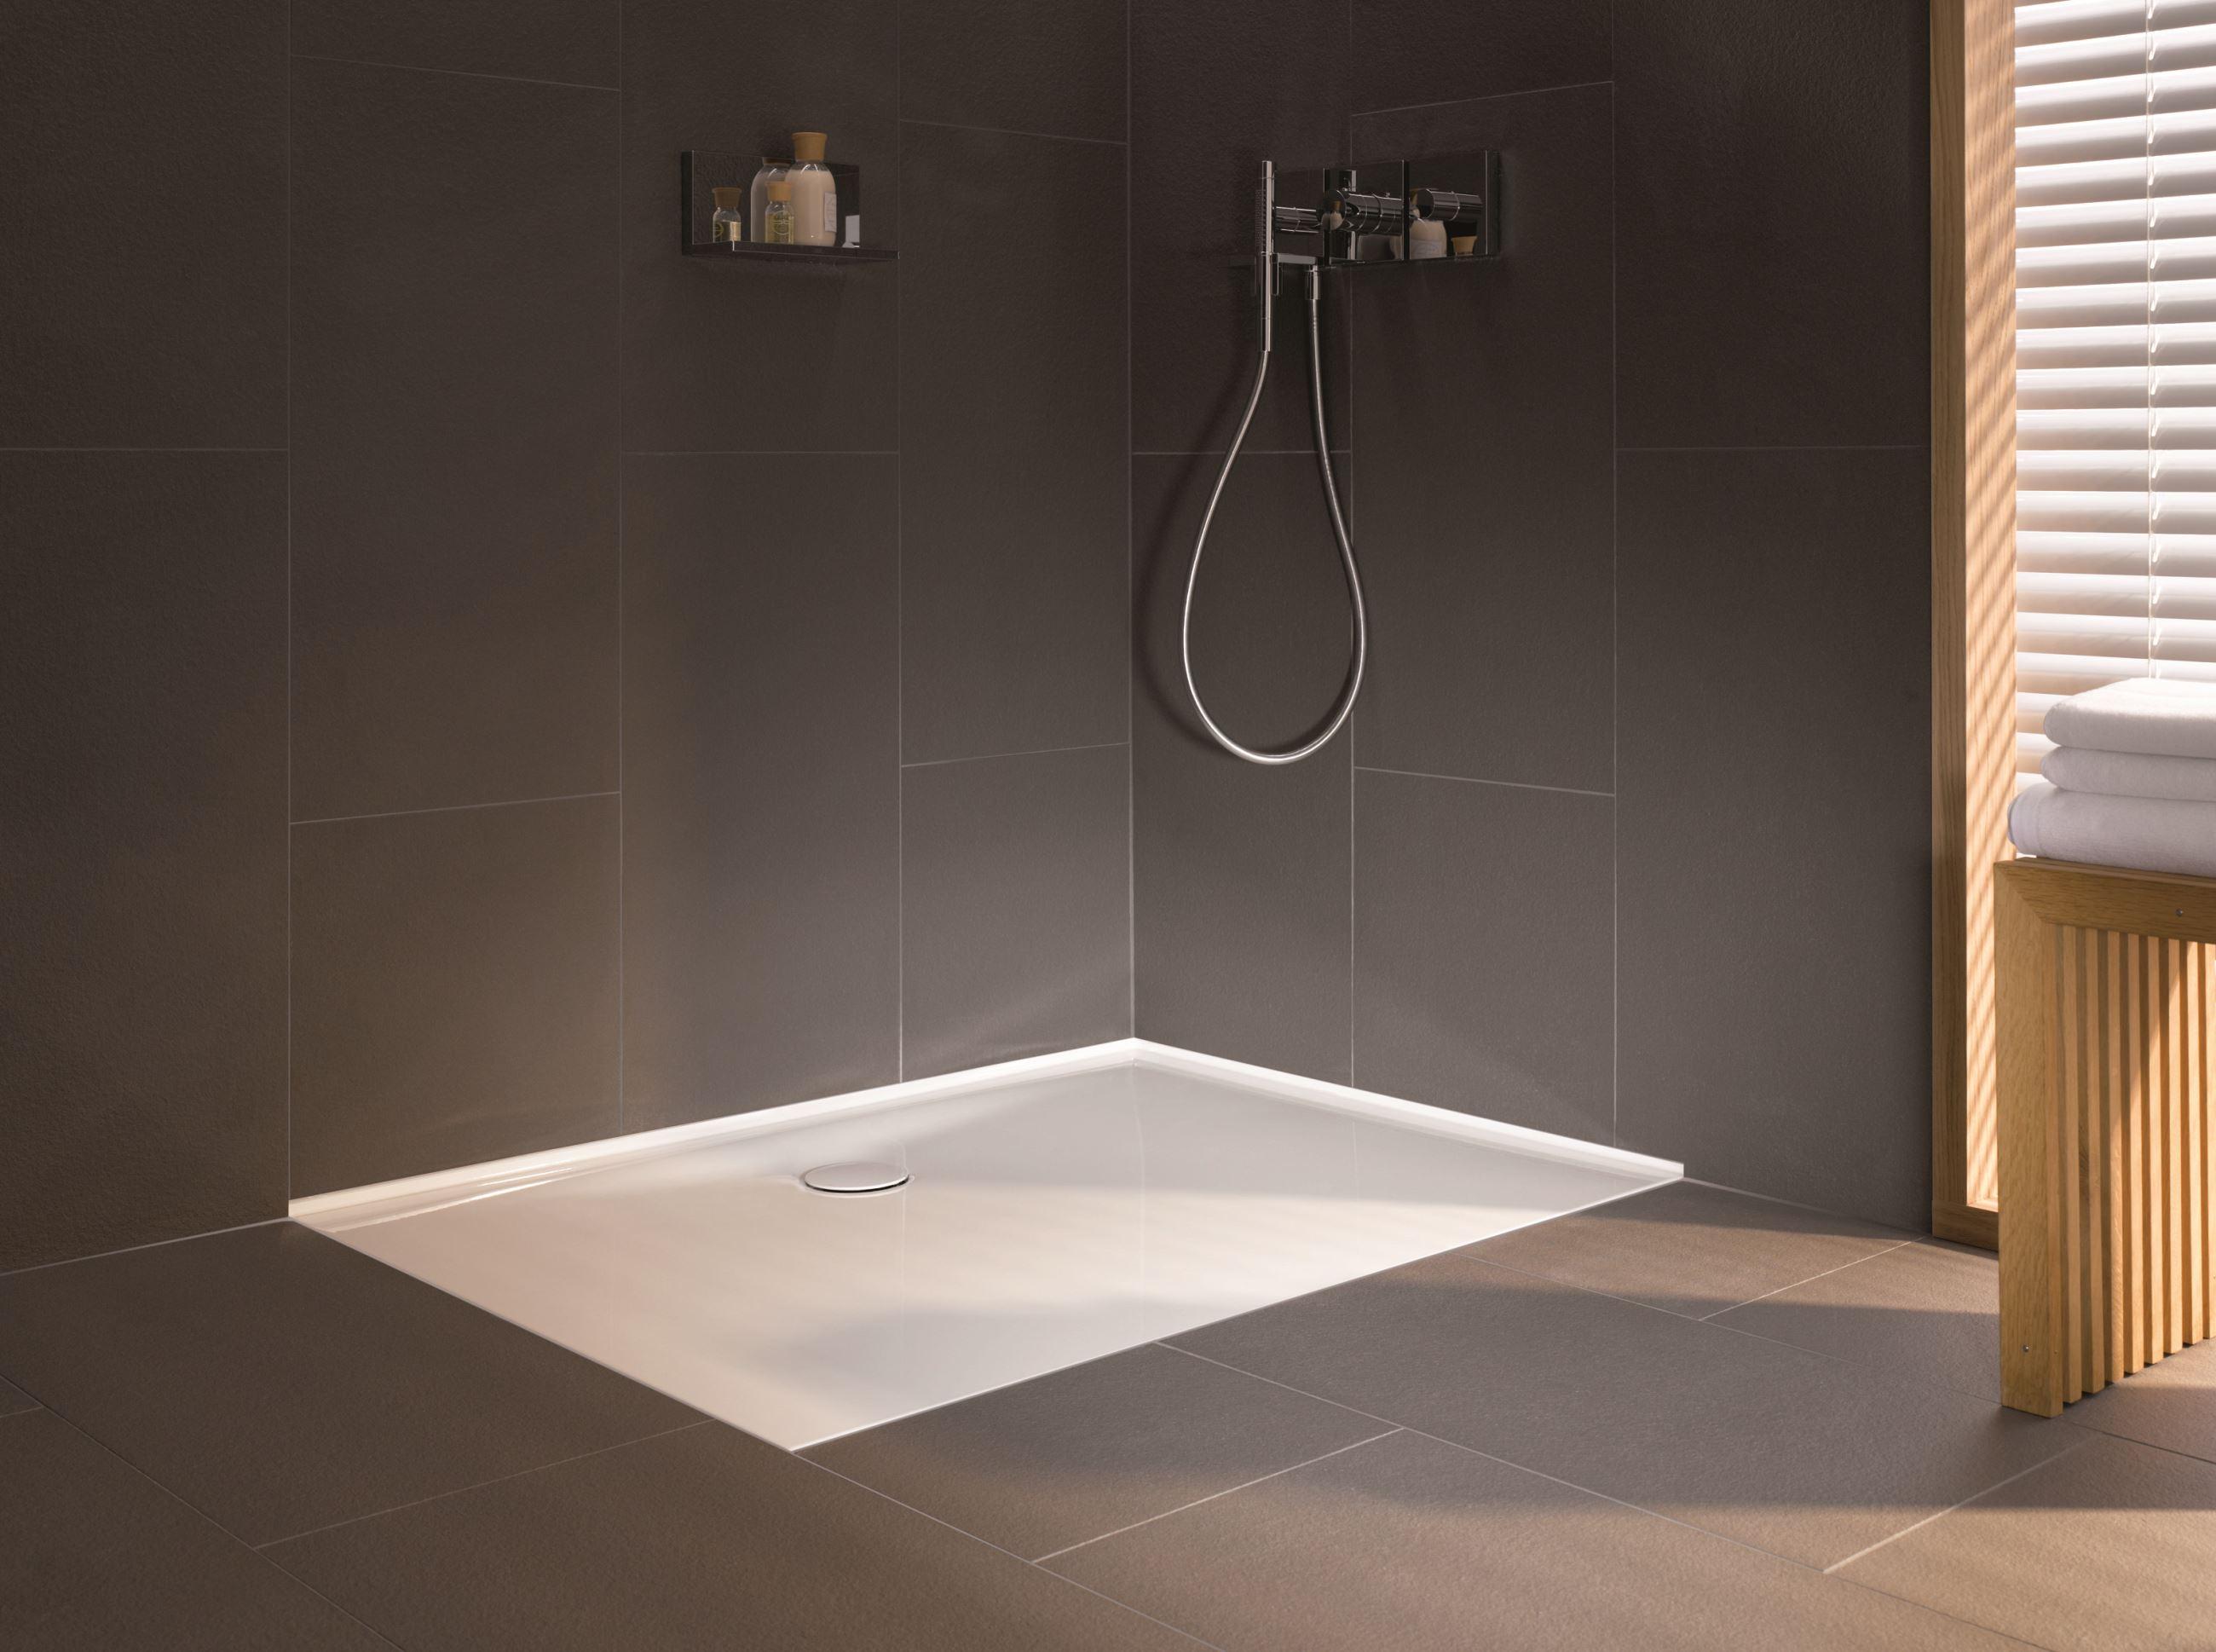 bette shower trays shop by brand doors trays. Black Bedroom Furniture Sets. Home Design Ideas